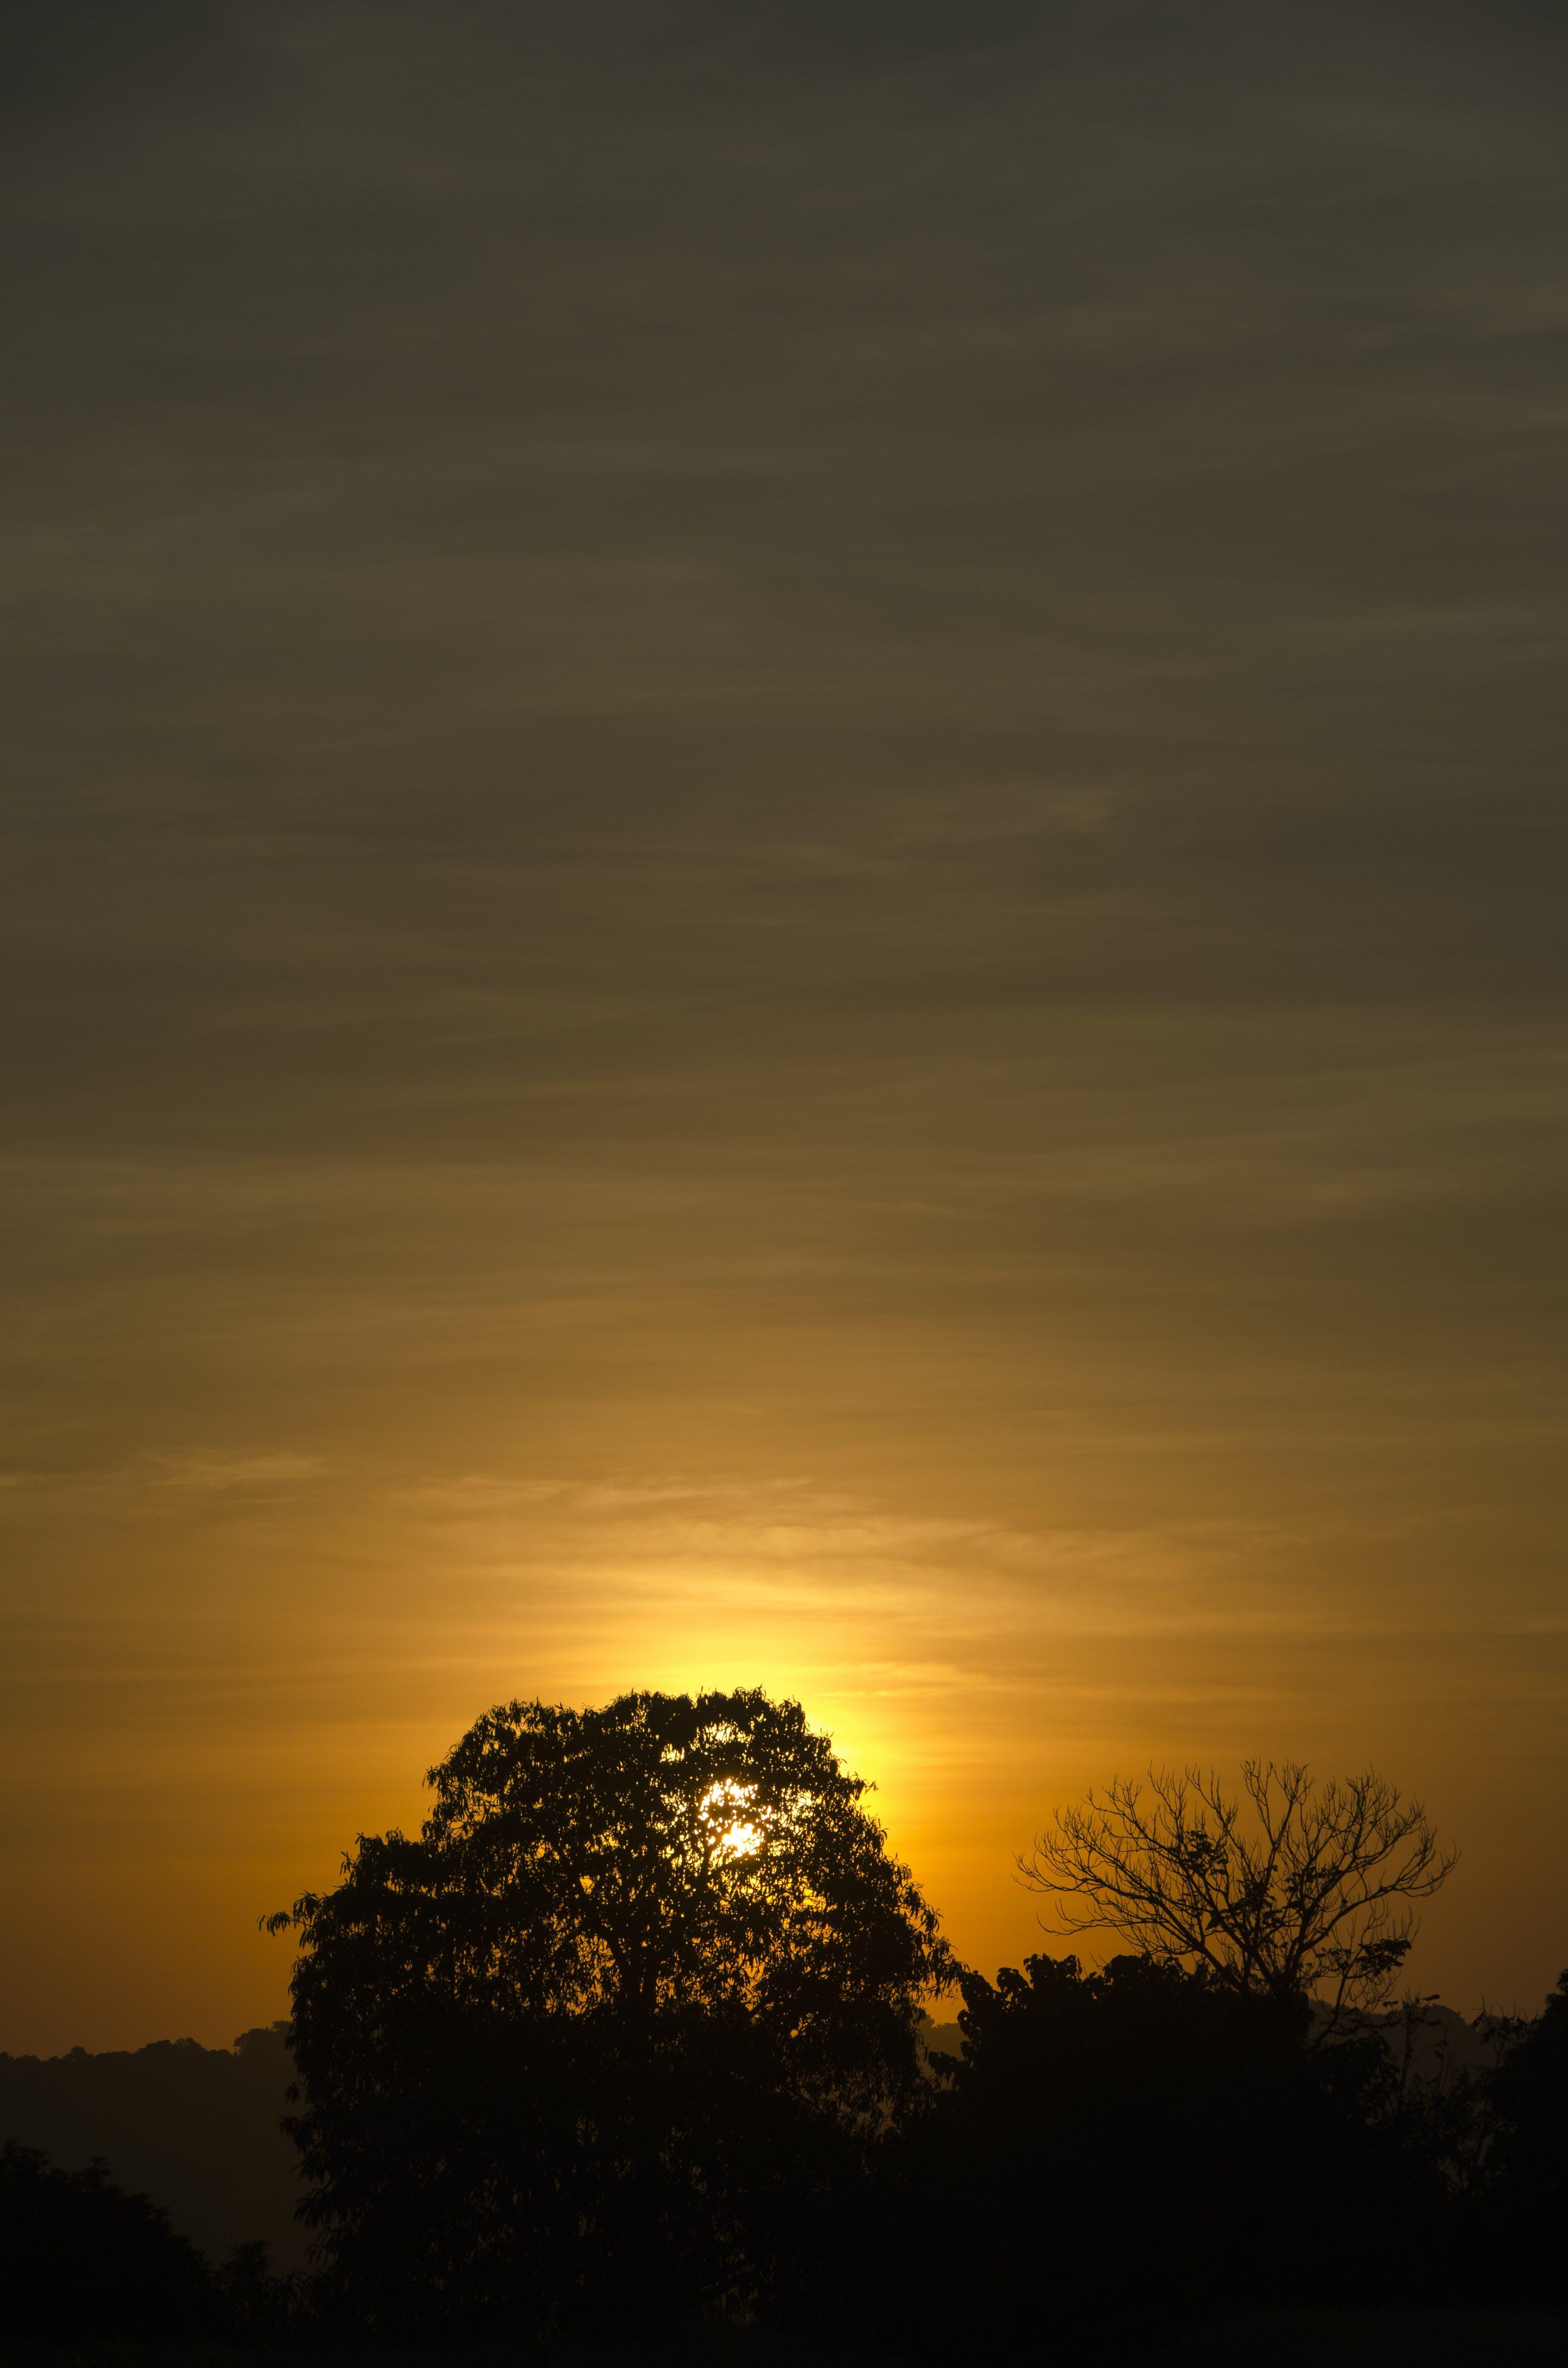 Silhouette of Trees Against Orange Sun during Sunsset